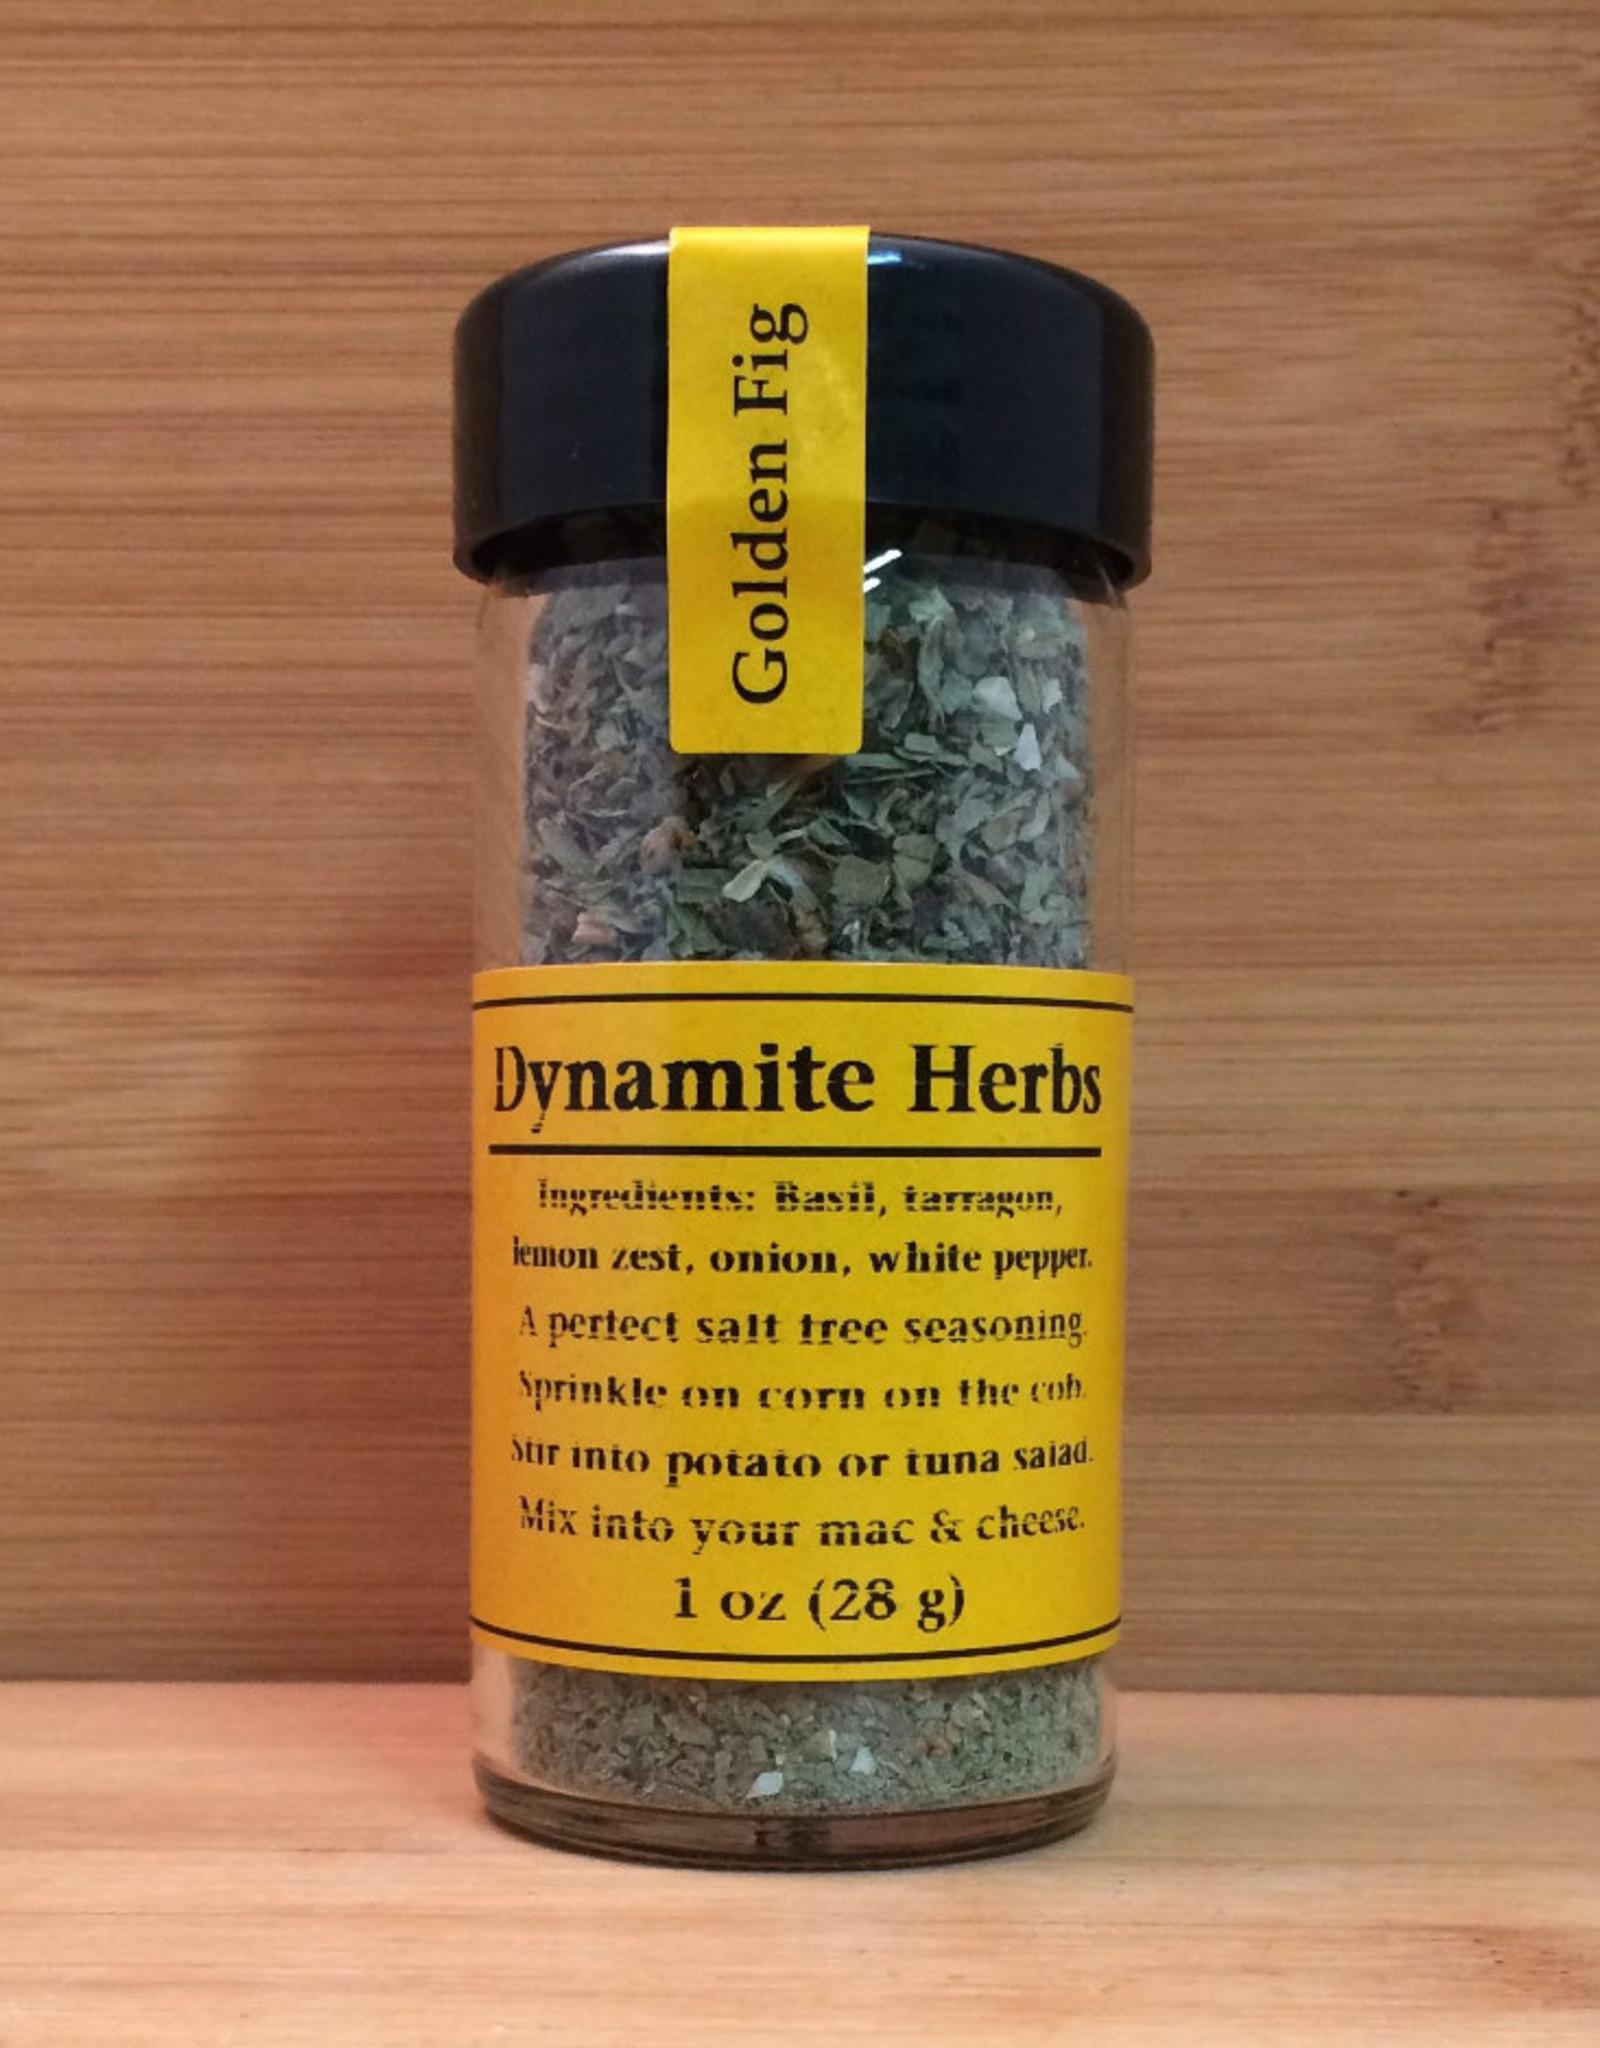 Golden Fig Dynamite Herbs, 4oz